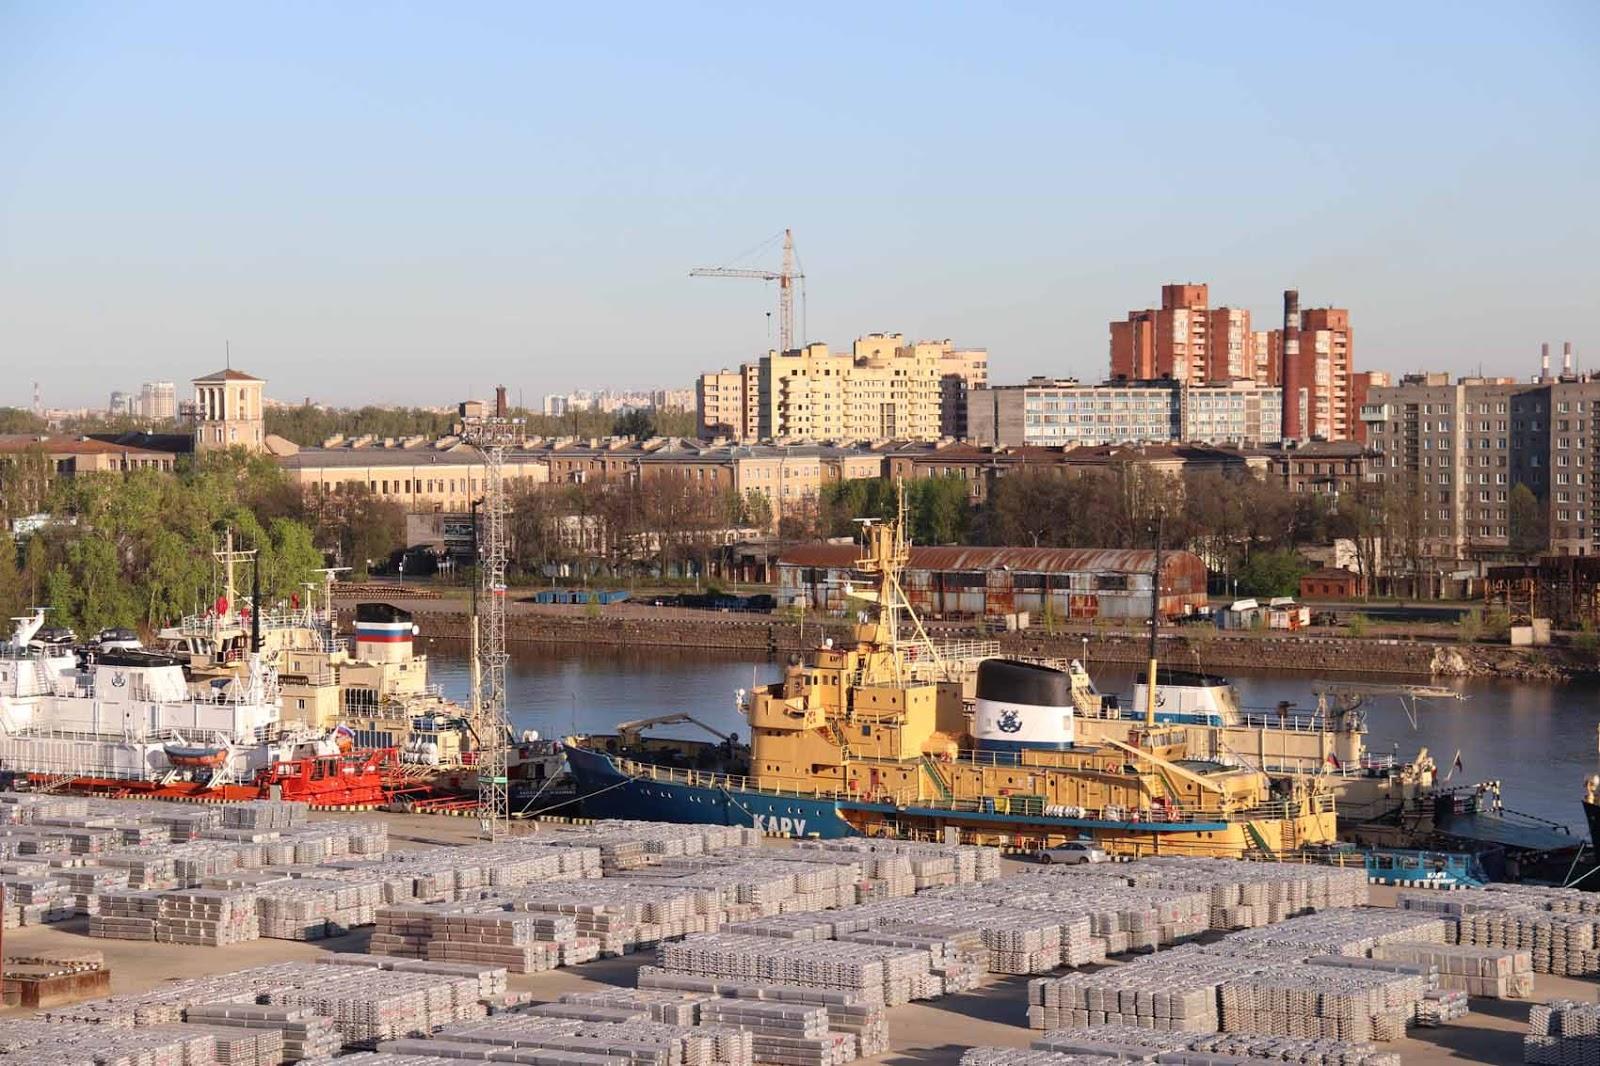 Pietarin satama-alue